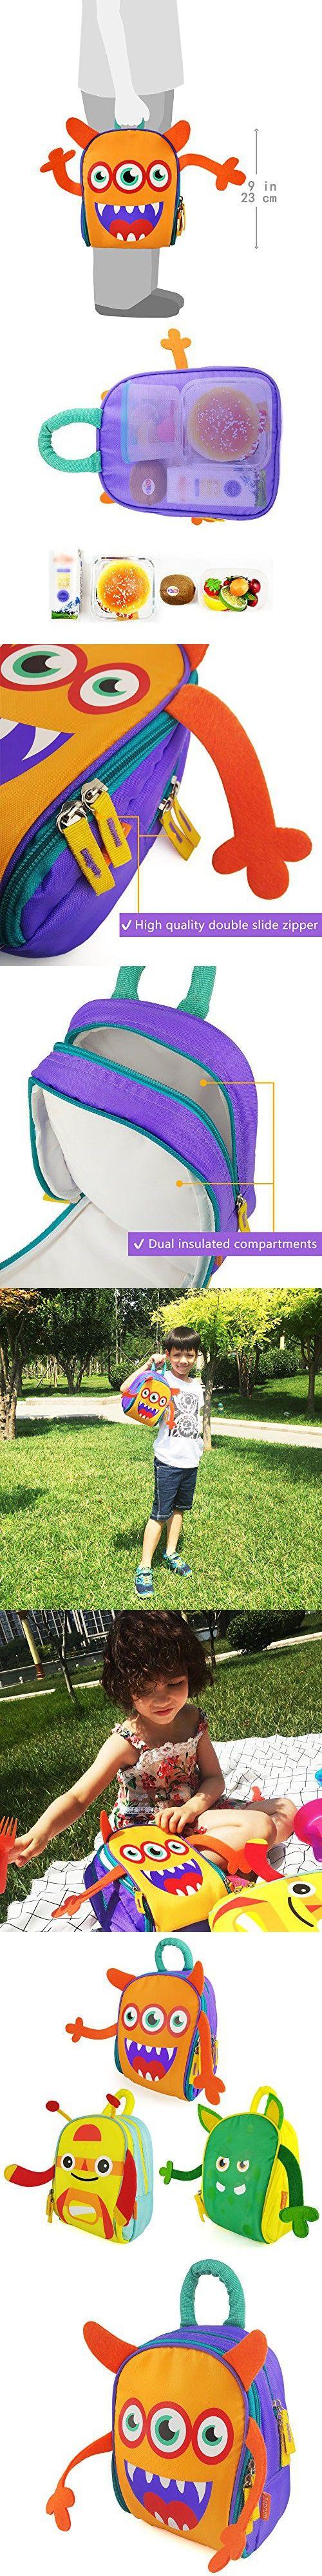 Zebrum Insulated Kids Lunch Box for School Boys &Girls with Dual Compartments, Kindergarten Kids Lunch Bag, Cute Cartoon Monster (Orange &Purple)